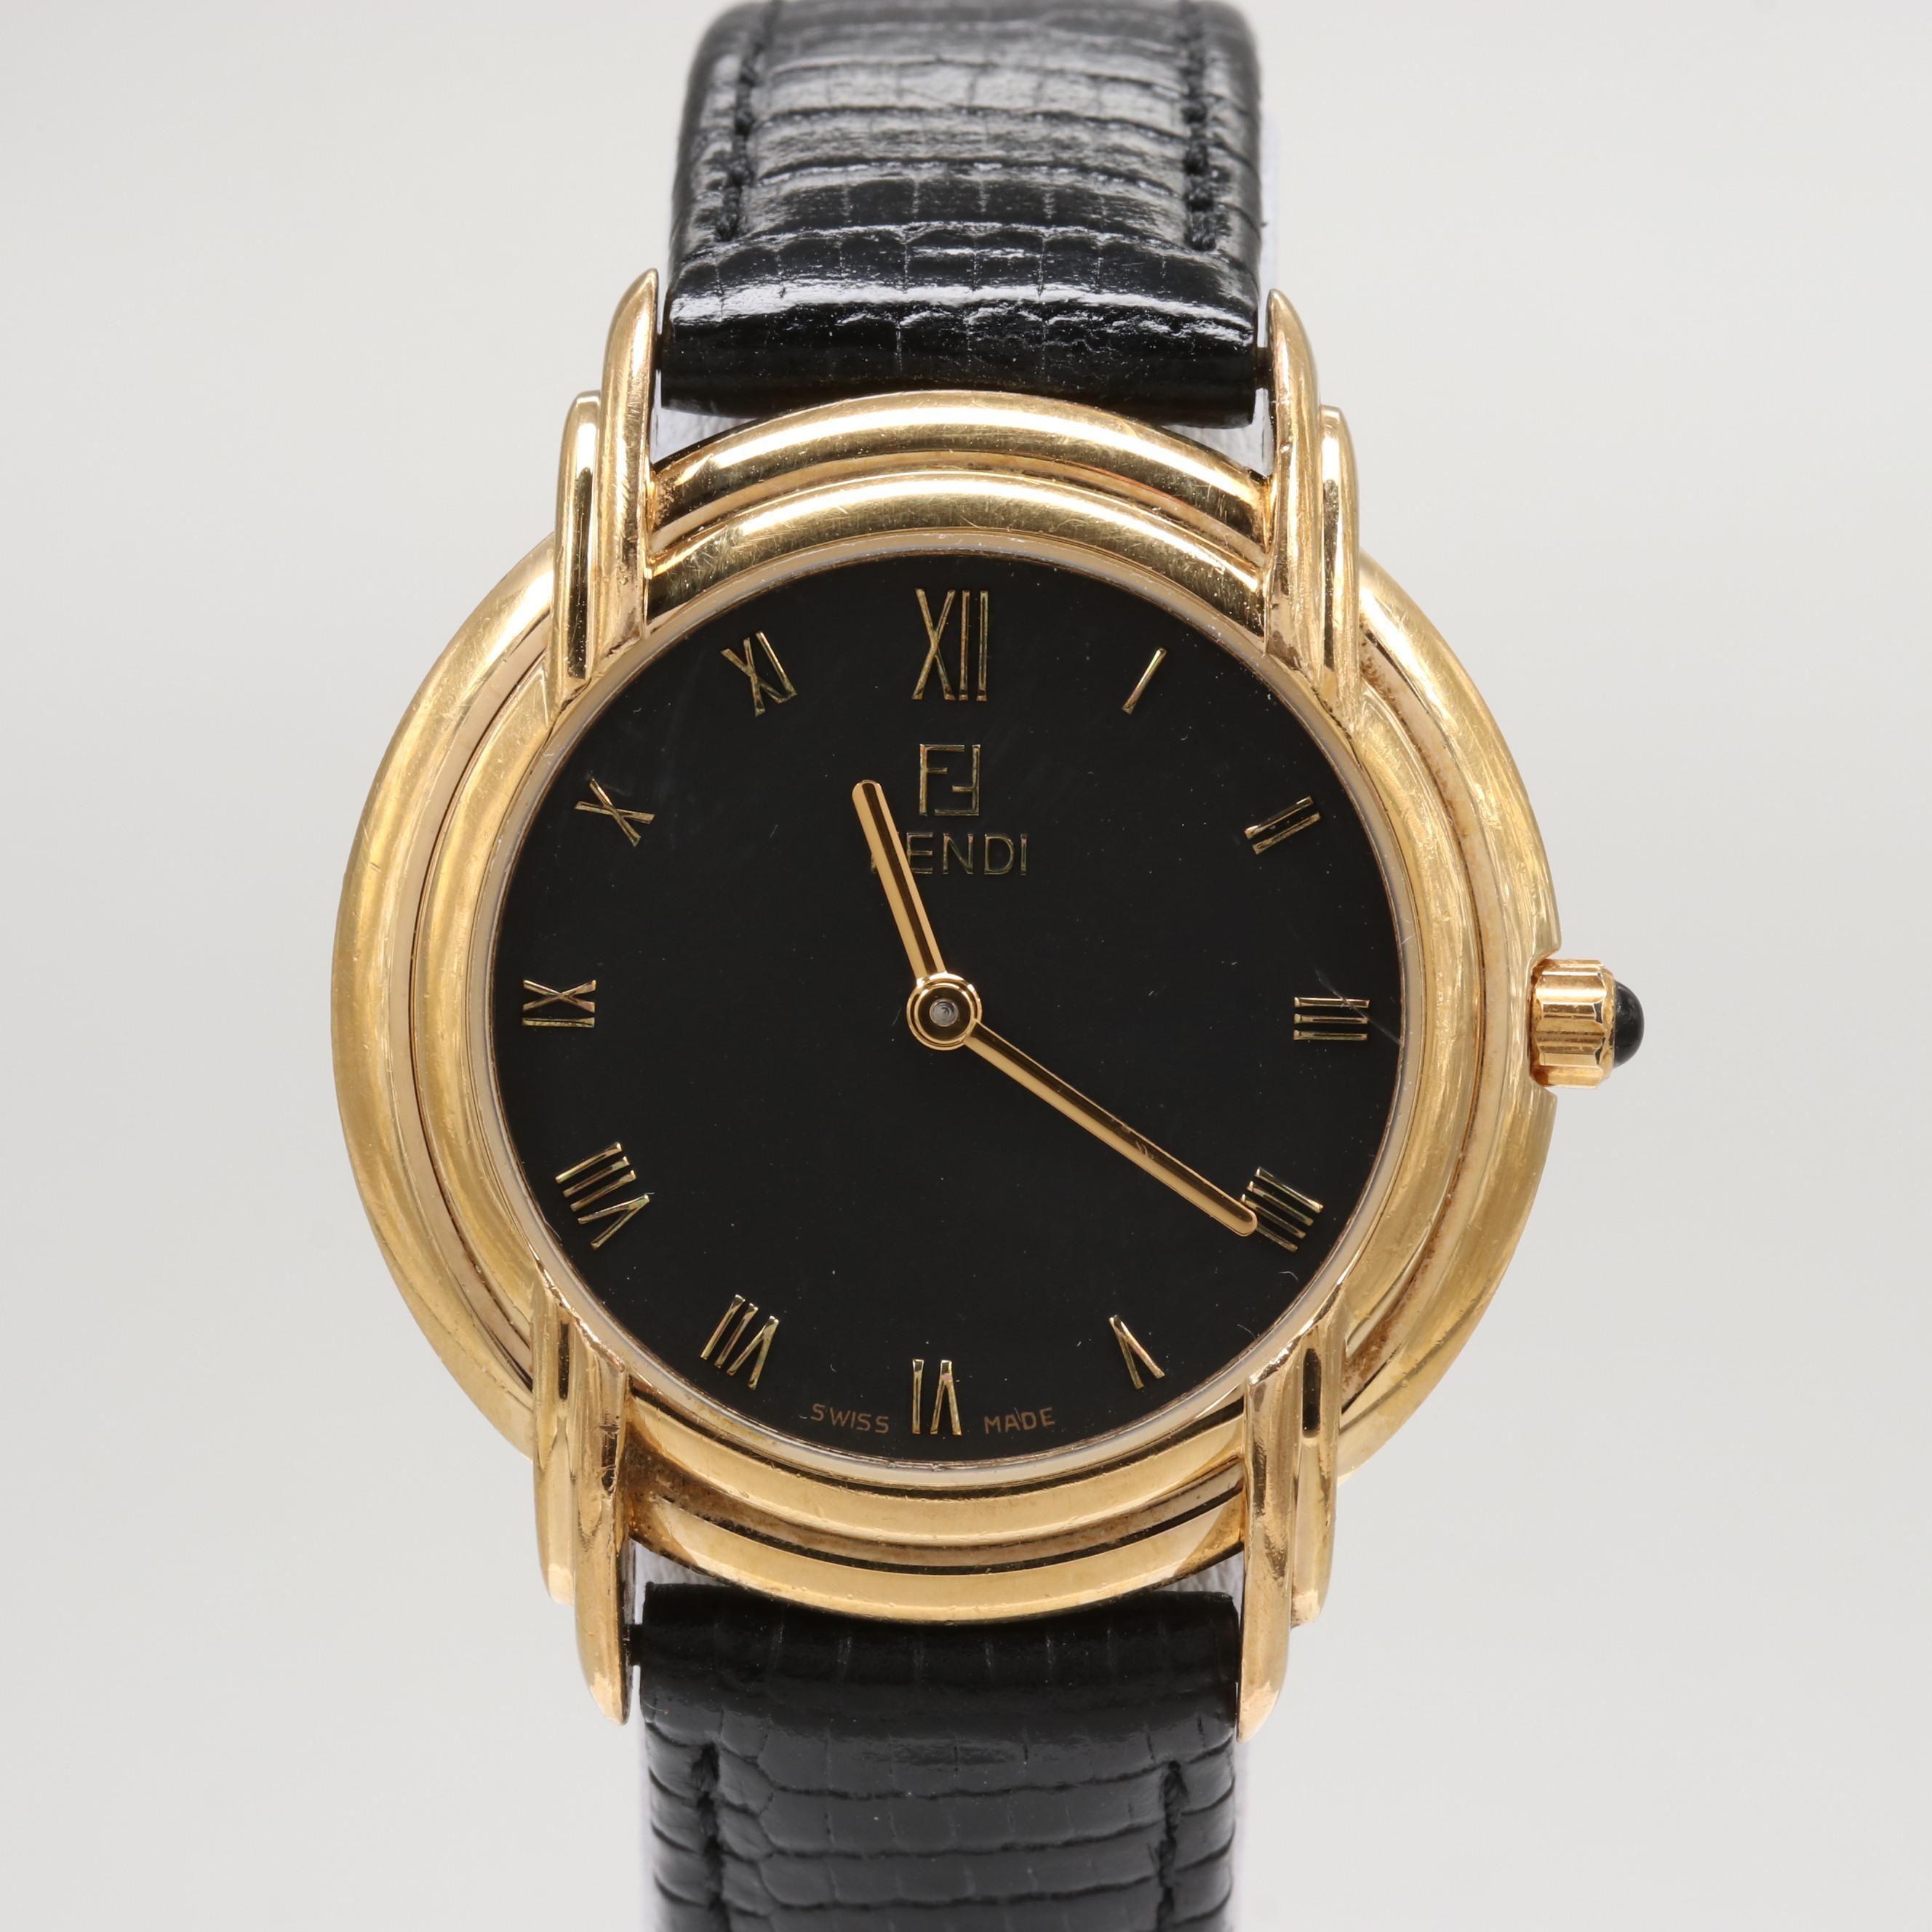 Fendi Gold Tone Wristwatch